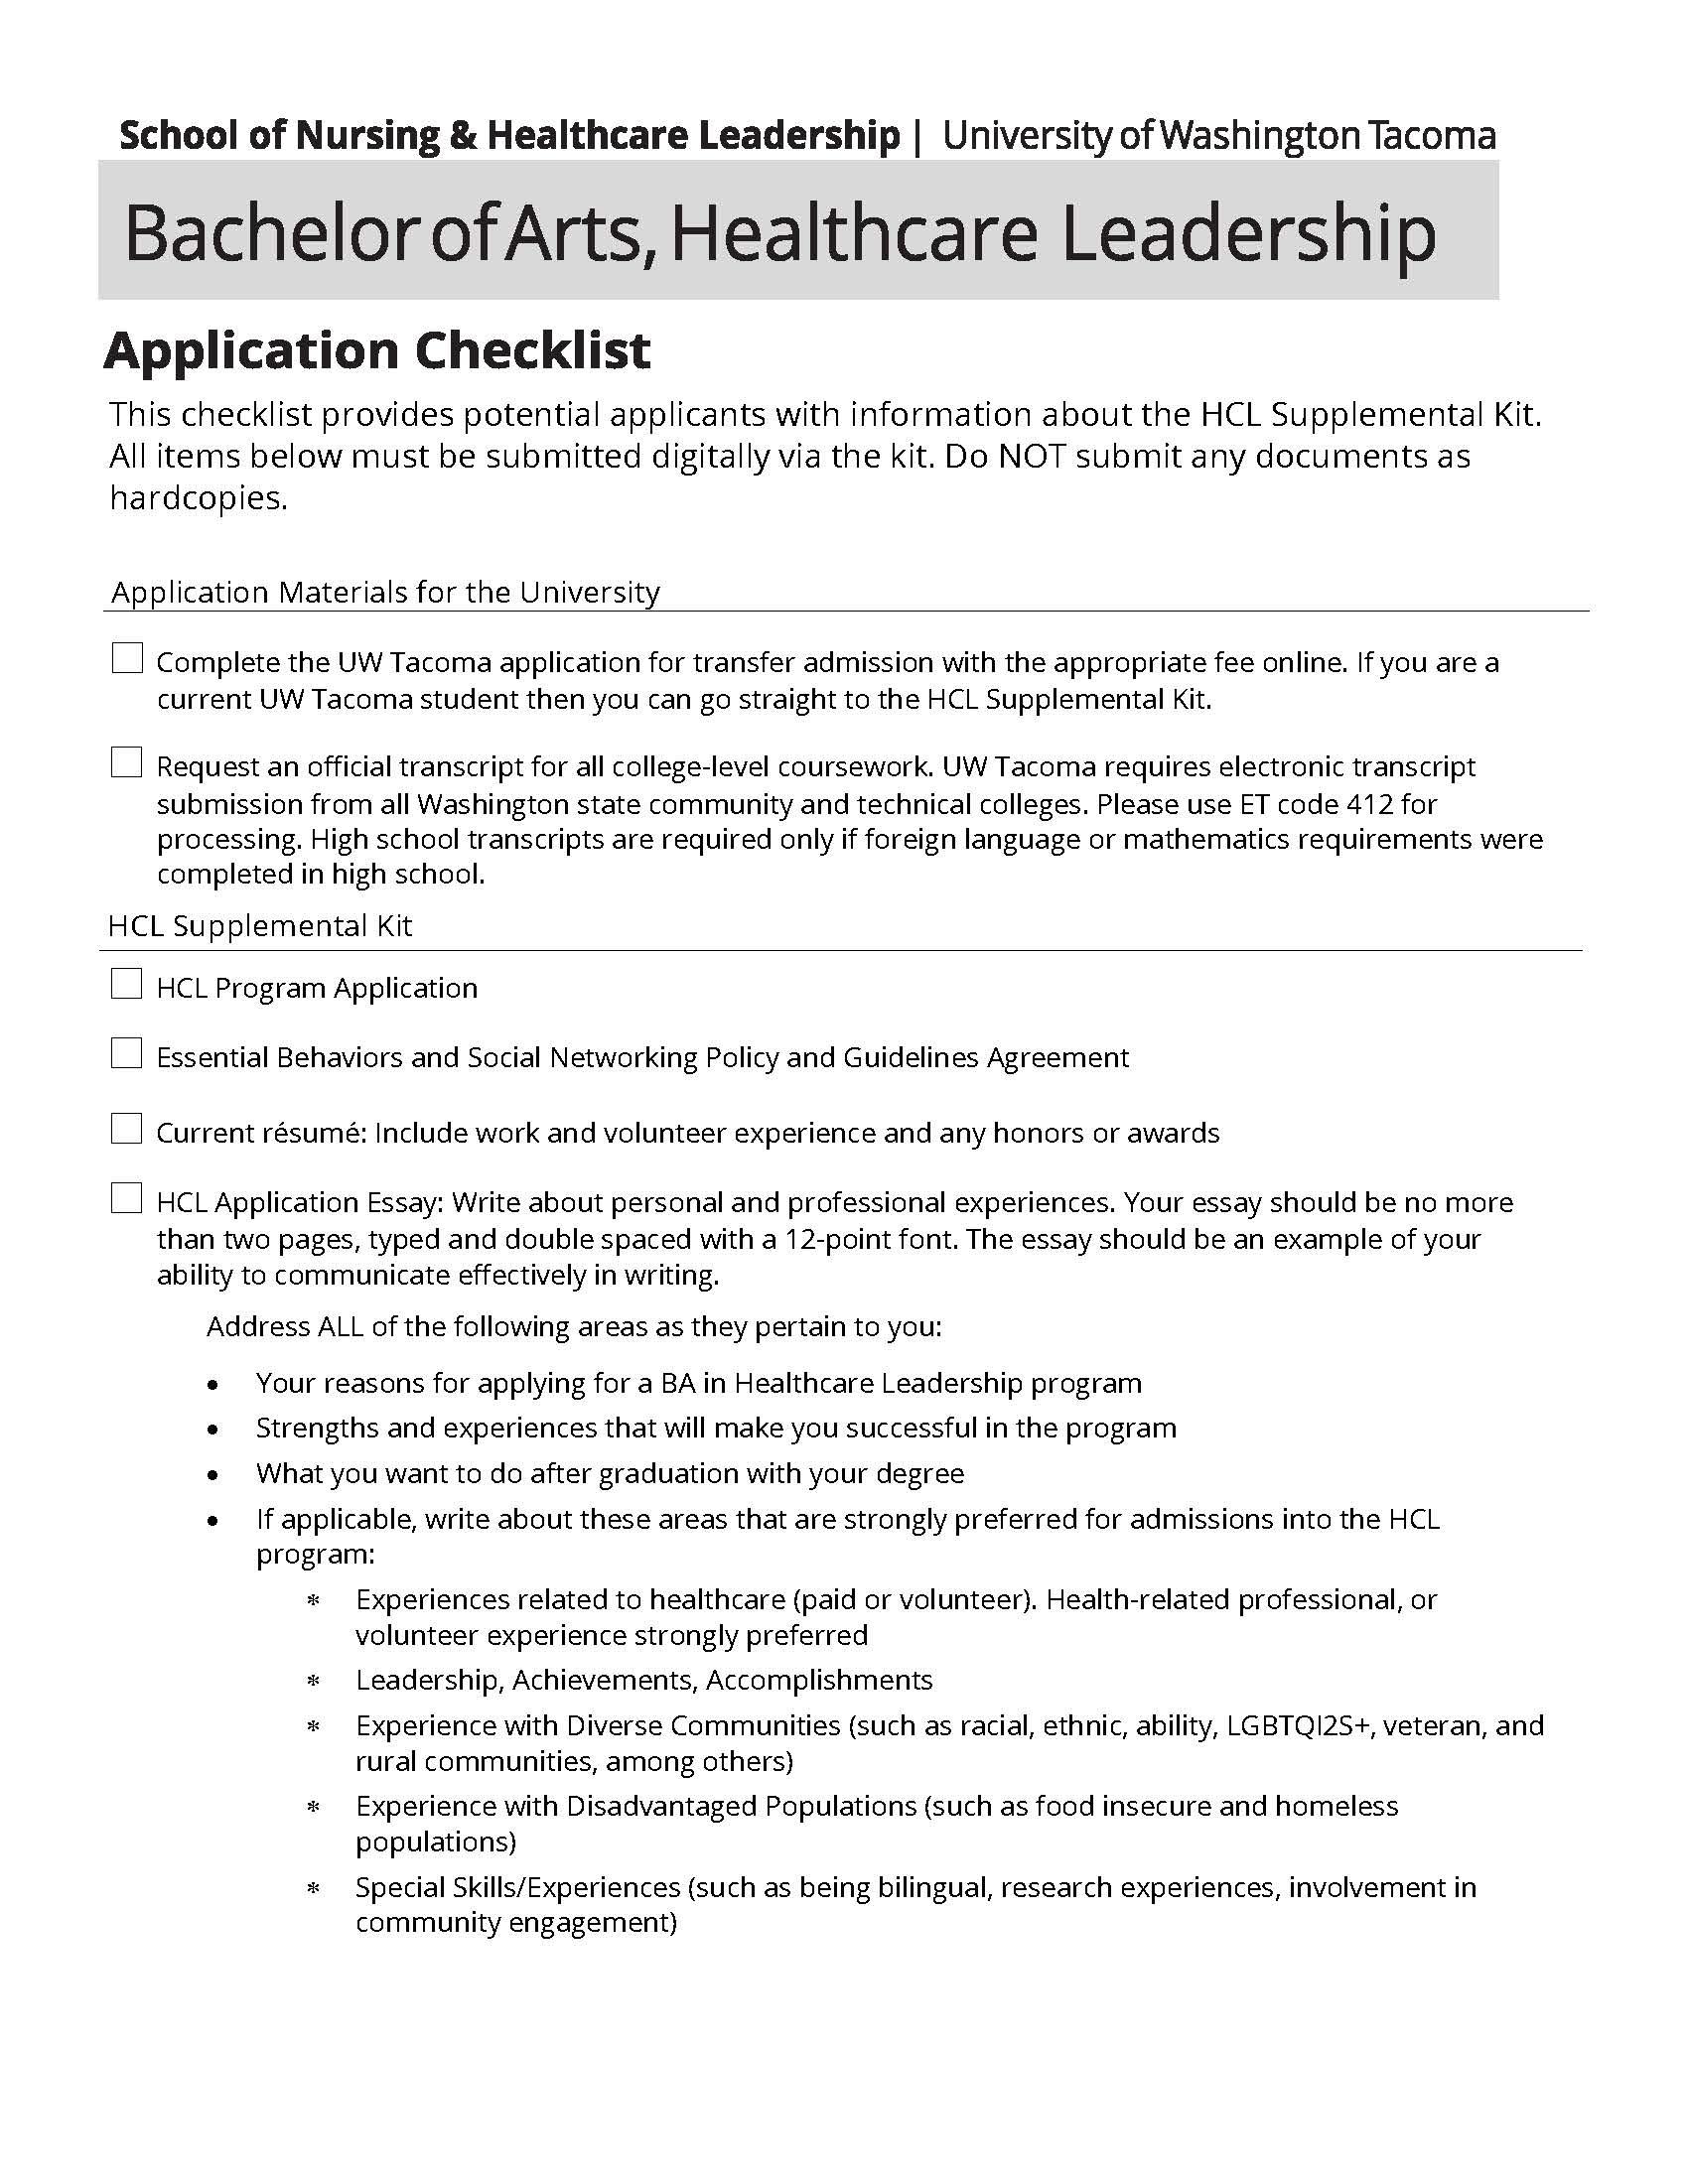 HCL Application Checklist